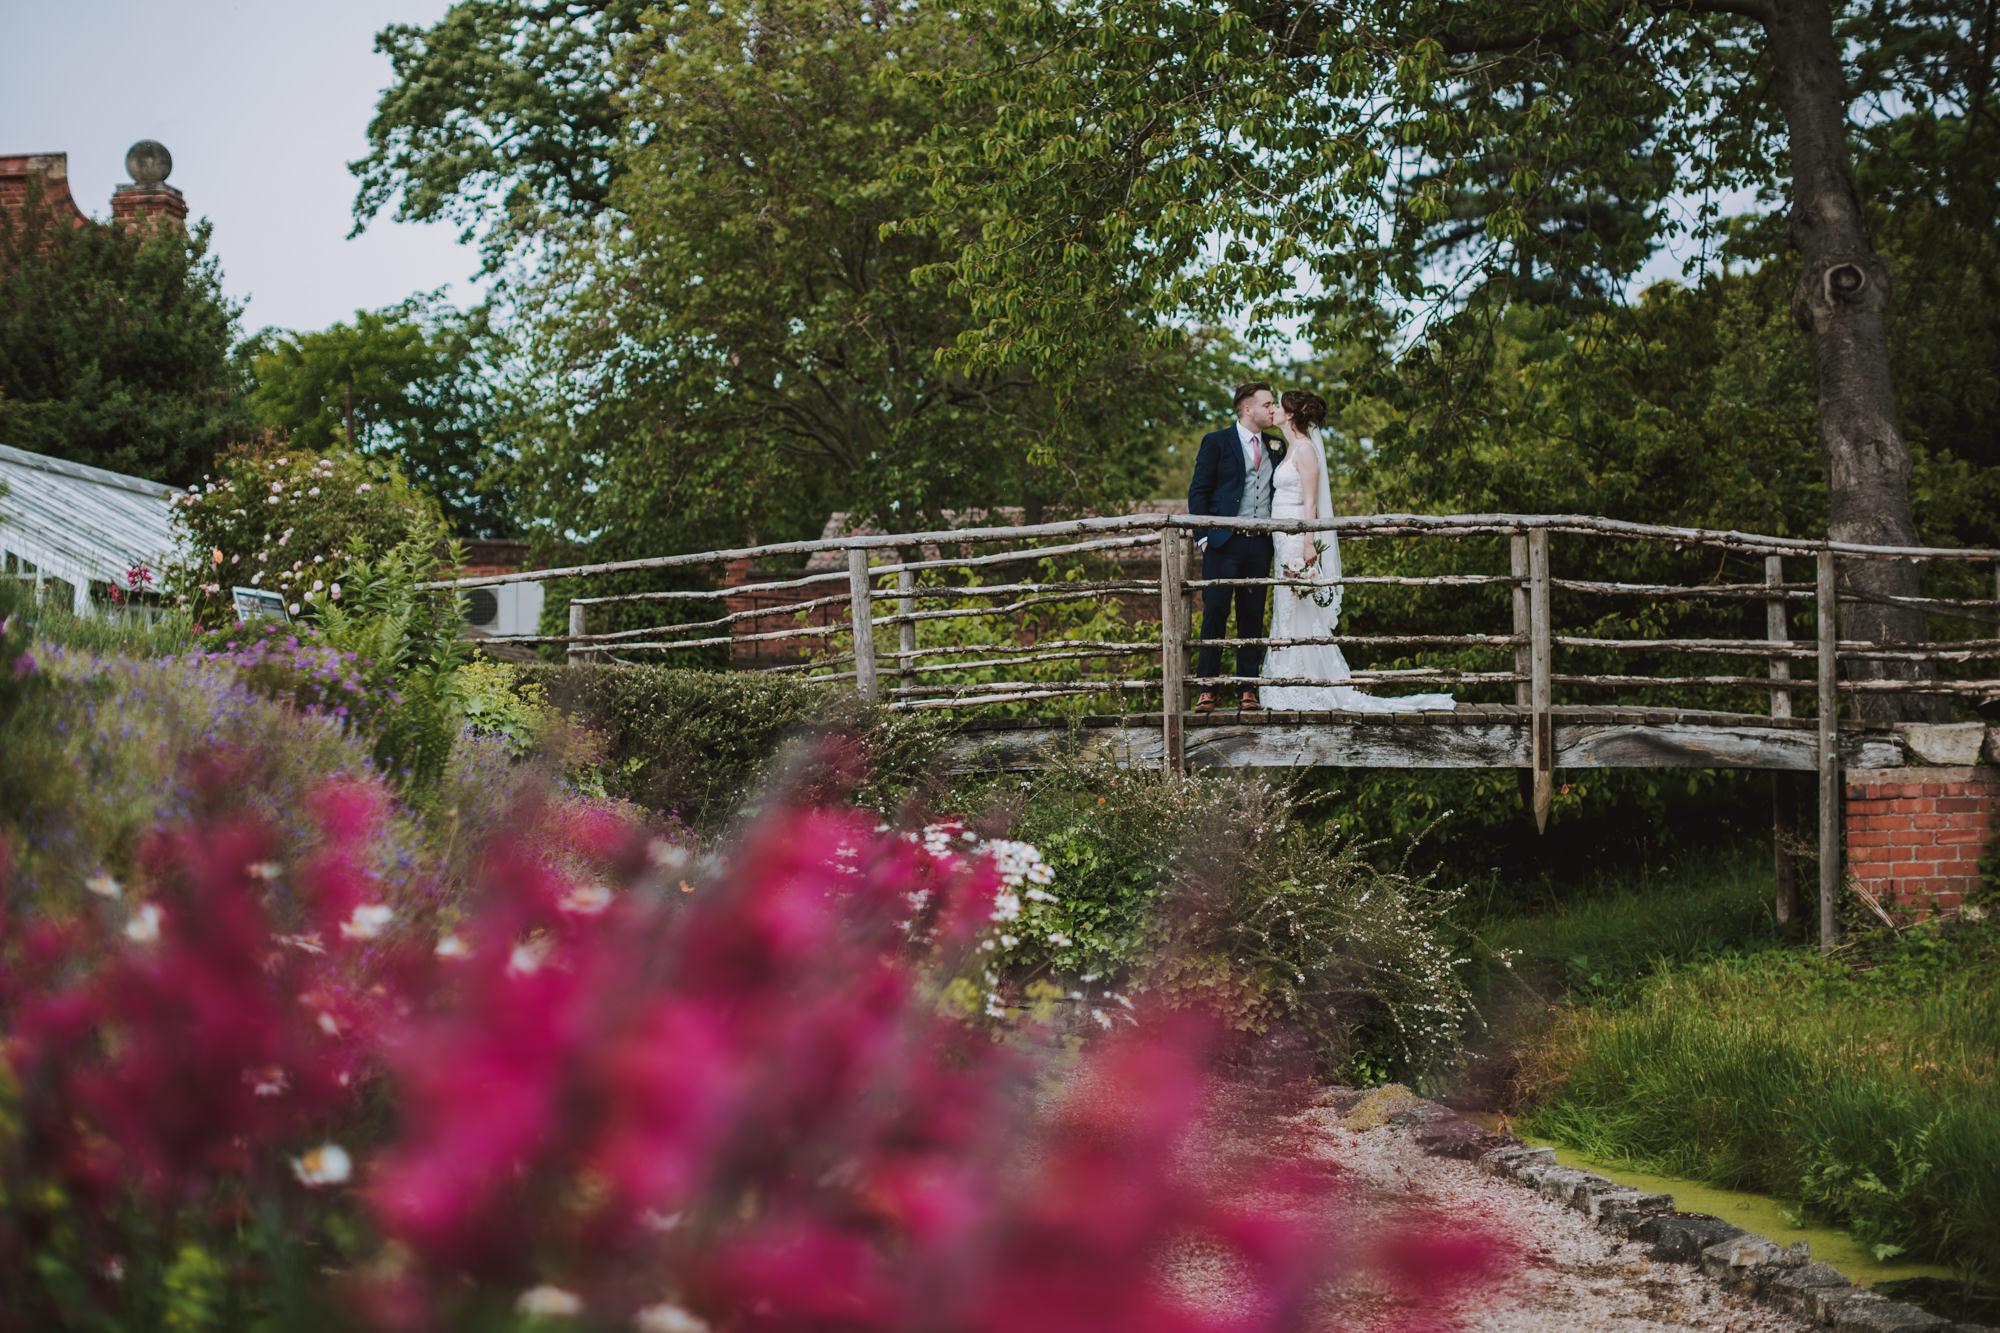 hodsock priory wedding photographers blog64.jpg